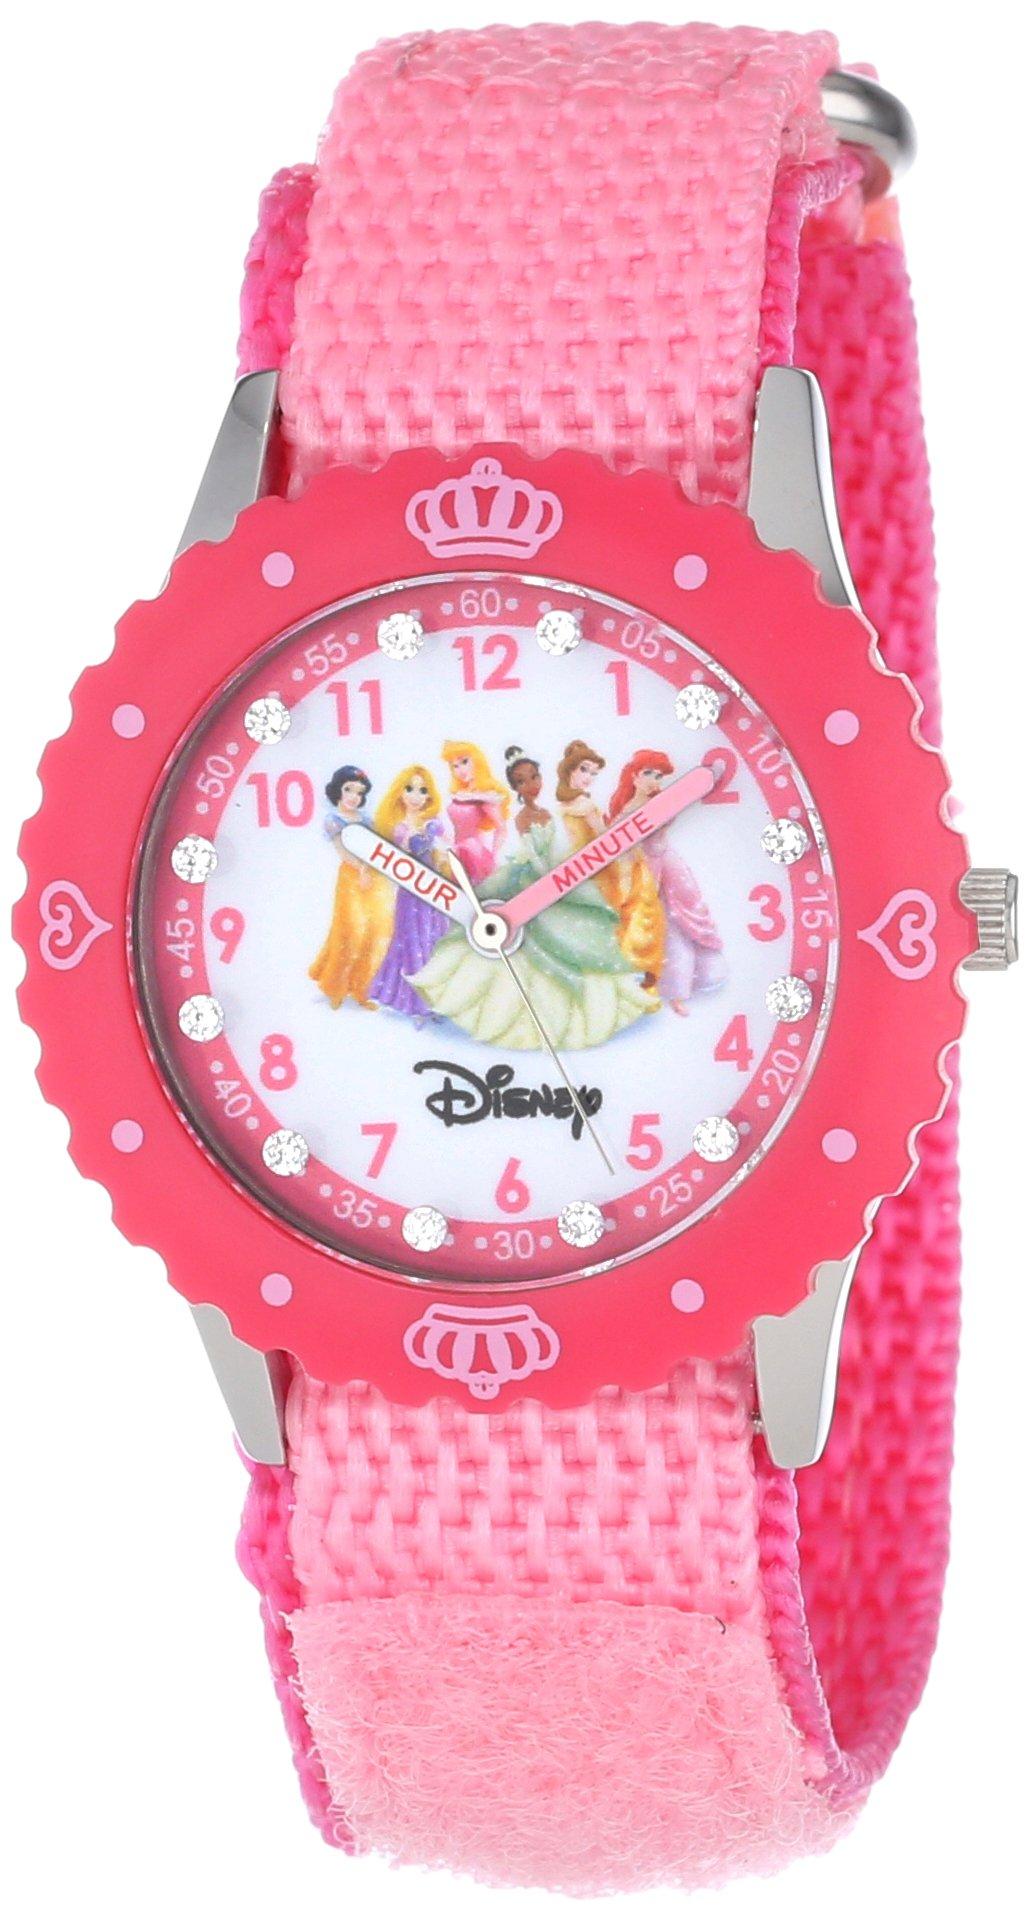 Disney Kids' W000385 Princess Glitz  Stainless Steel Time Teacher Pink Bezel Pink Nylon Strap Watch by Disney